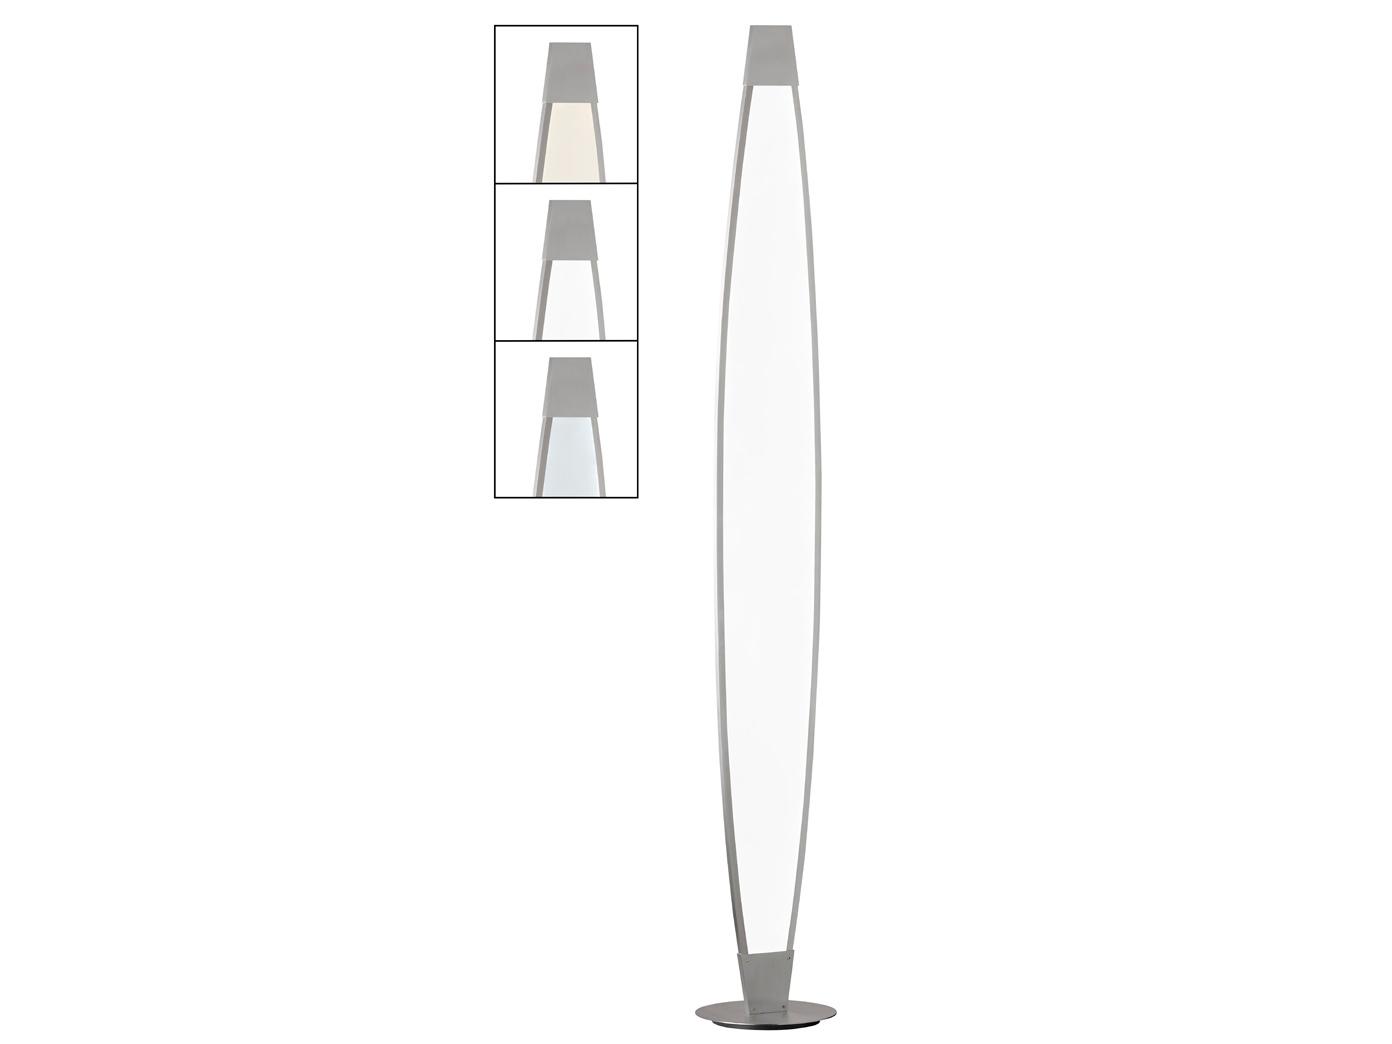 Full Size of Stehlampe Led Dimmbar Shine H 150 Cm Brolampen Designlampen Sofa Kunstleder Wildleder Wohnzimmer Deckenleuchte Stehlampen Leder Braun Bad Spiegelschrank Wohnzimmer Stehlampe Led Dimmbar